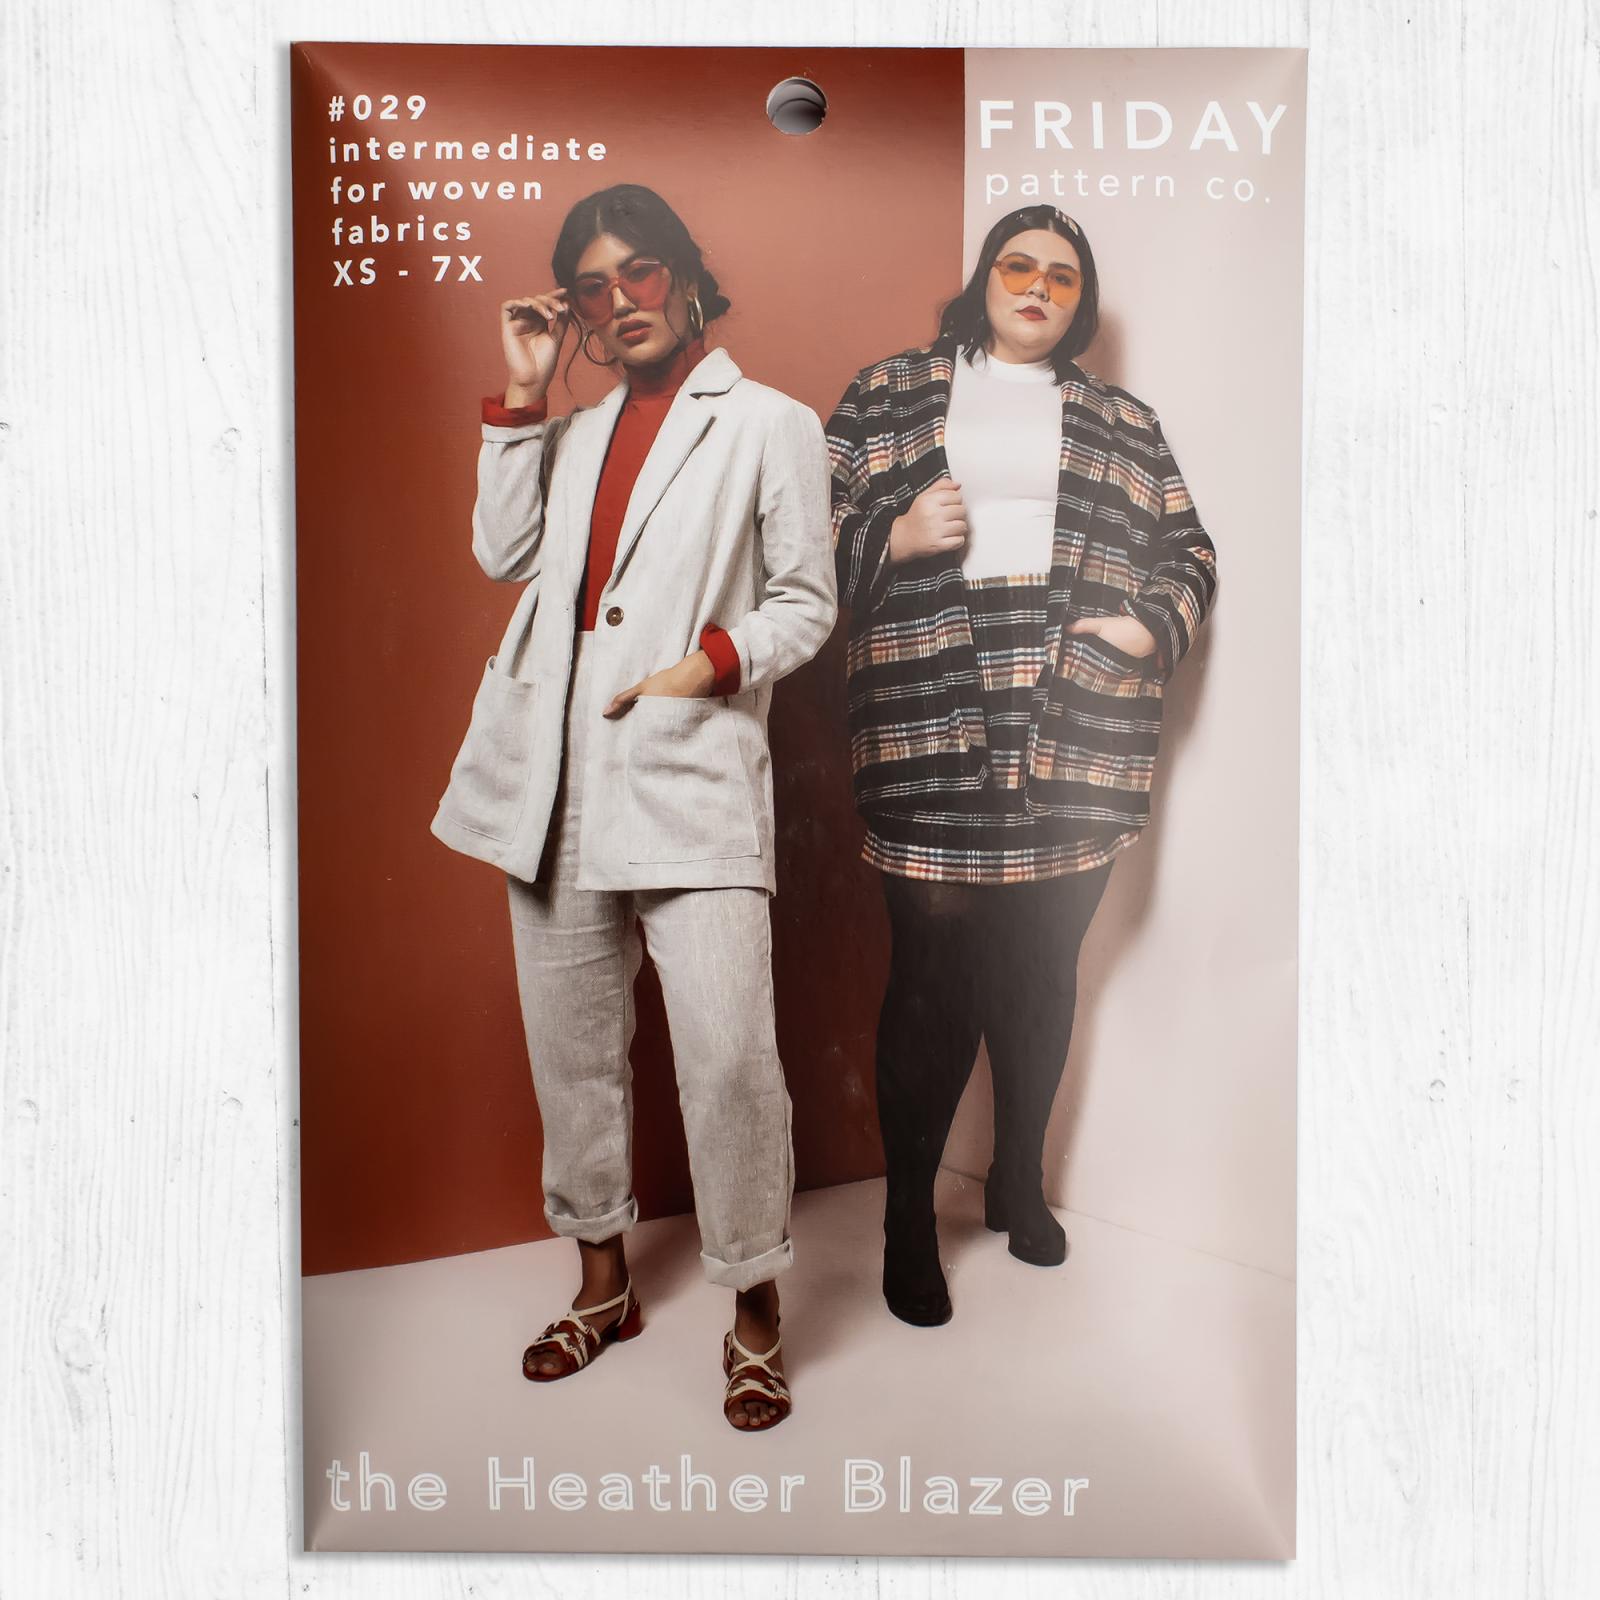 Friday Pattern Co. - The Heather Blazer